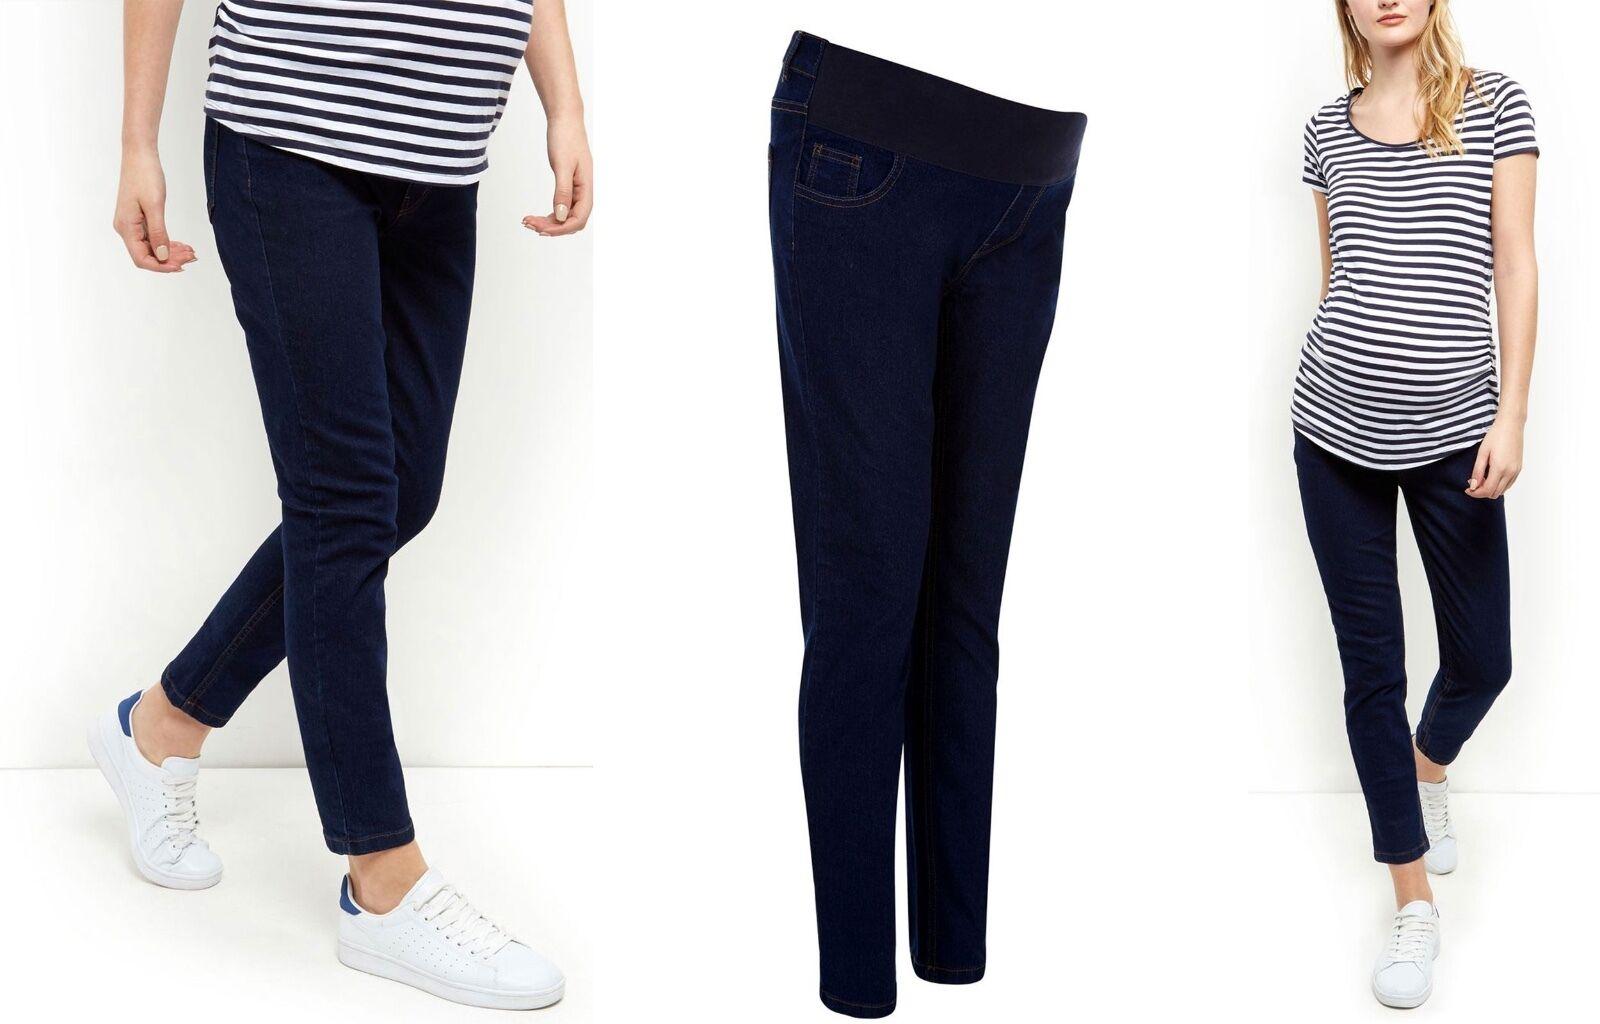 NEW LOOK bleu Denim marine de maternité grossesse Jean Skinny Denim bleu Smart Pantalon Taille 8 - 20 6a462e